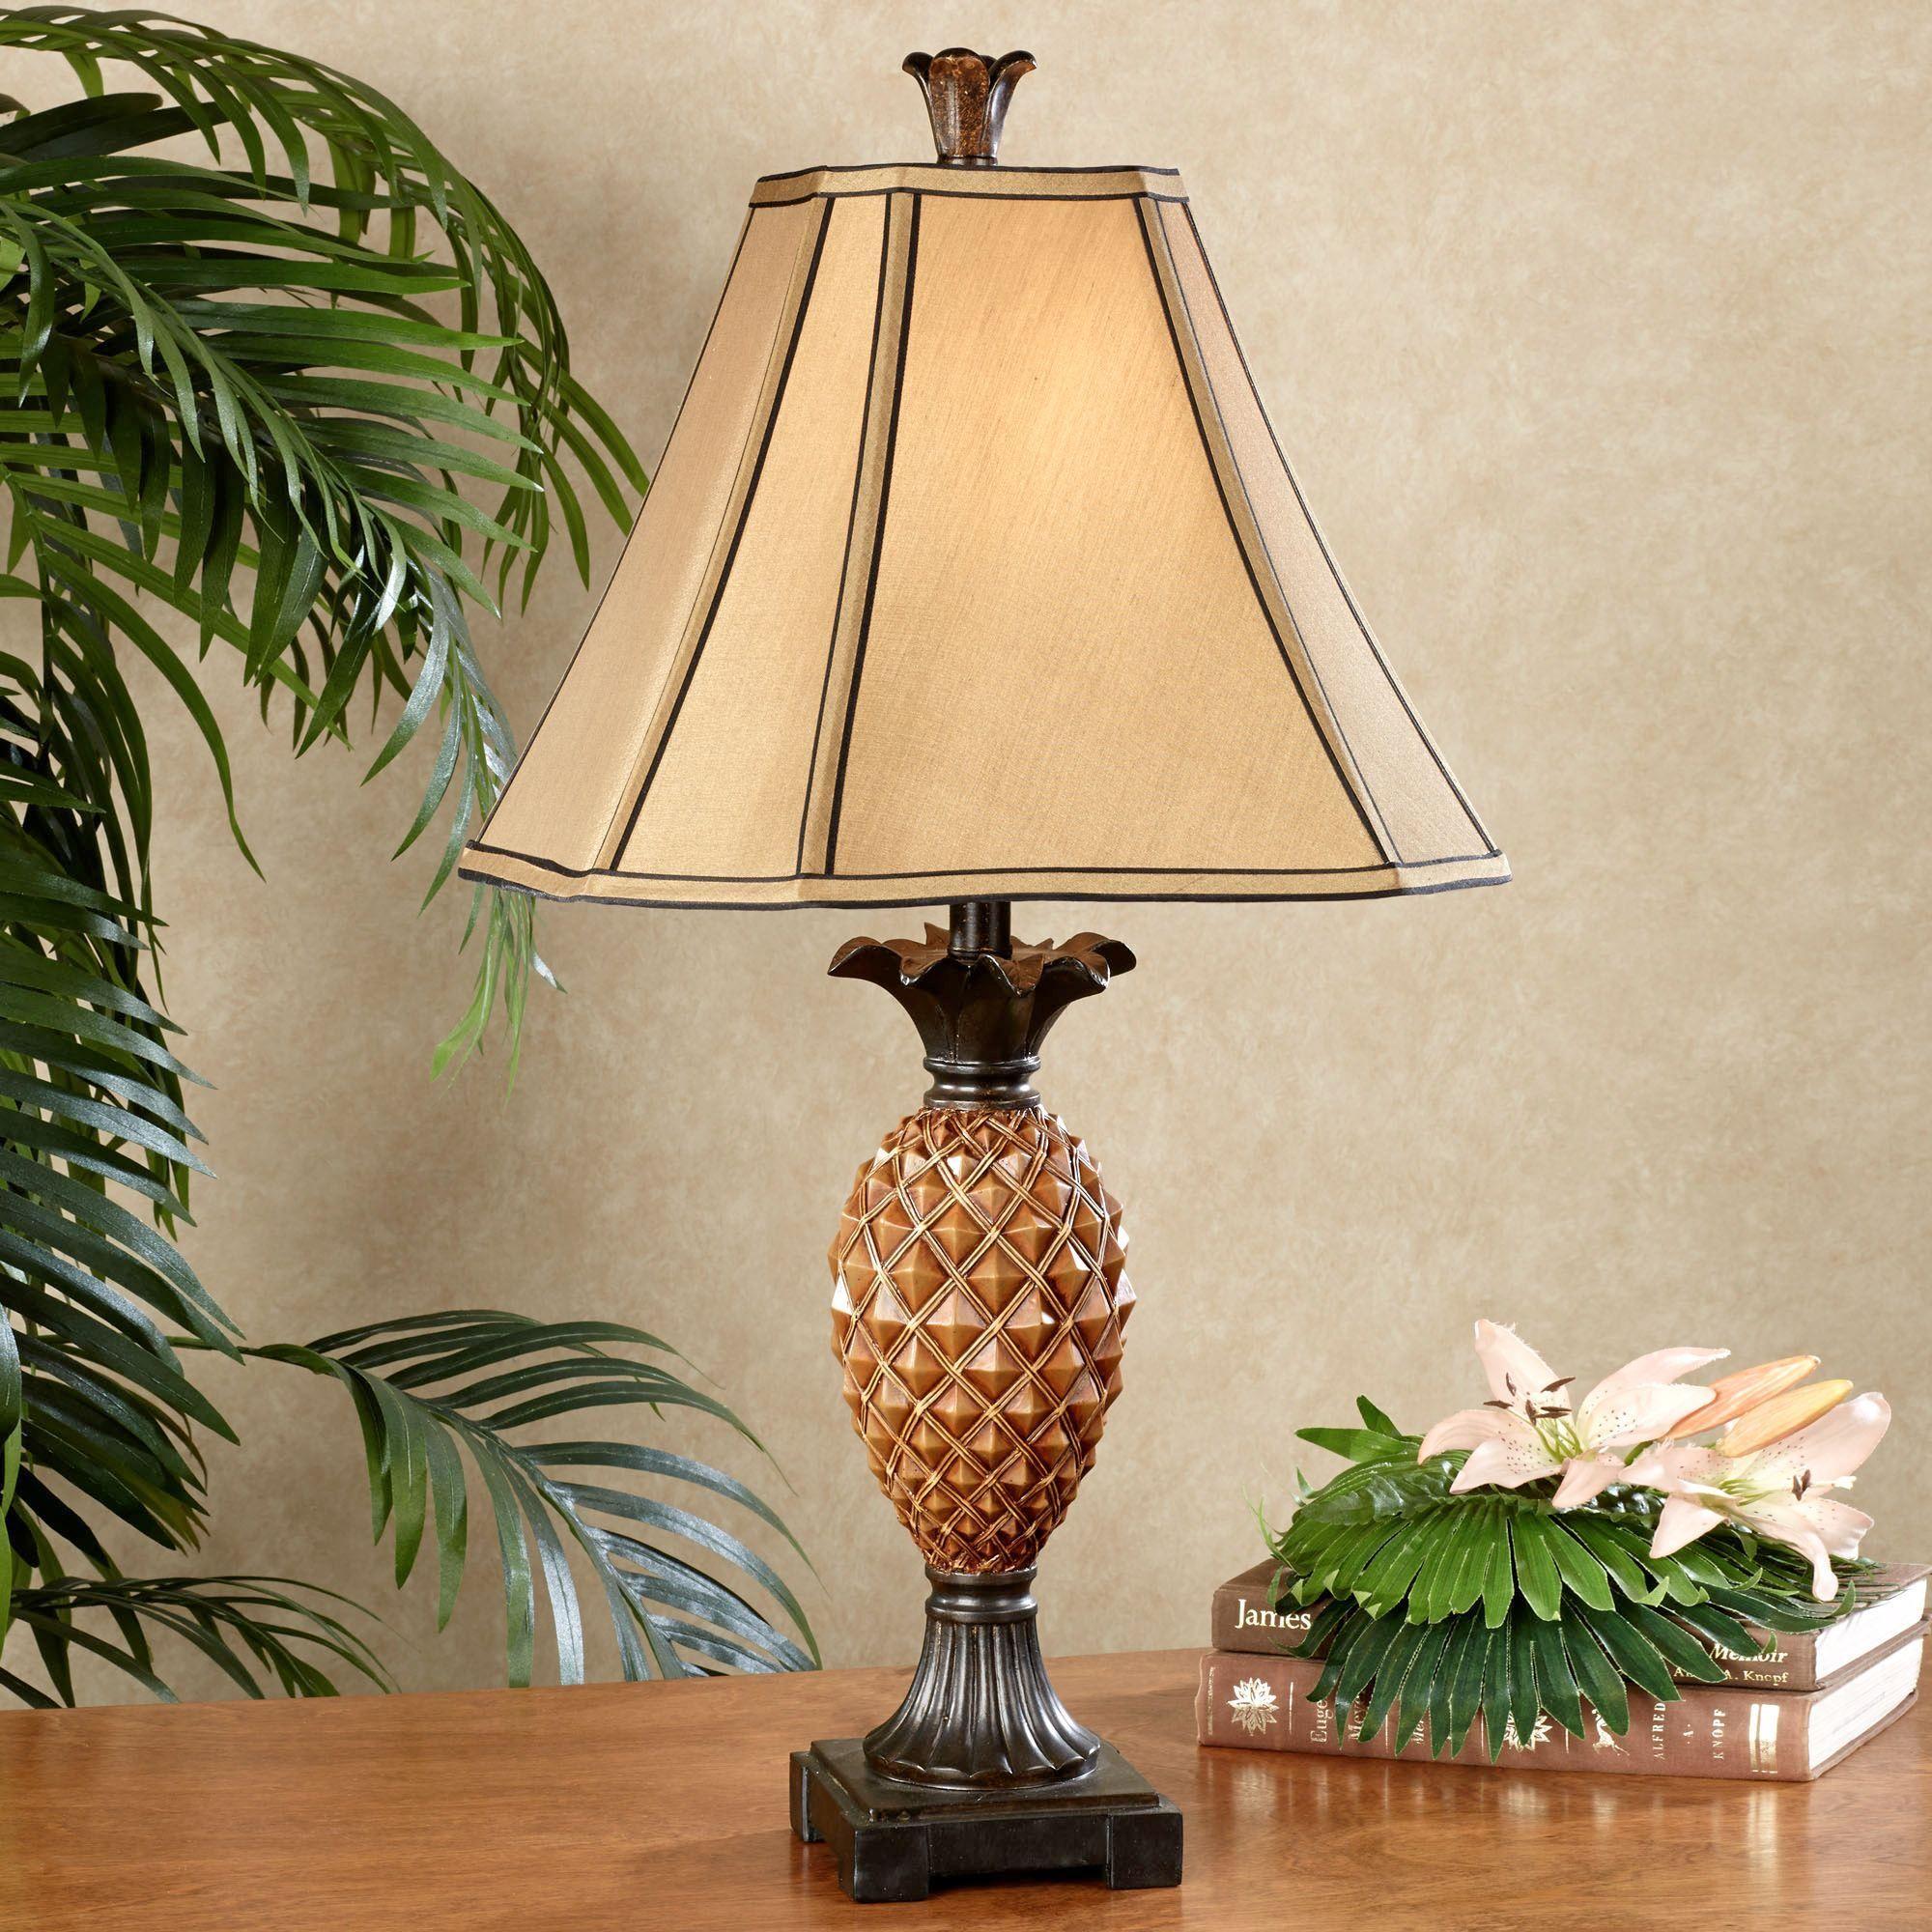 Haina Tropical Pineapple Table Lamp Table Lamp Lamp